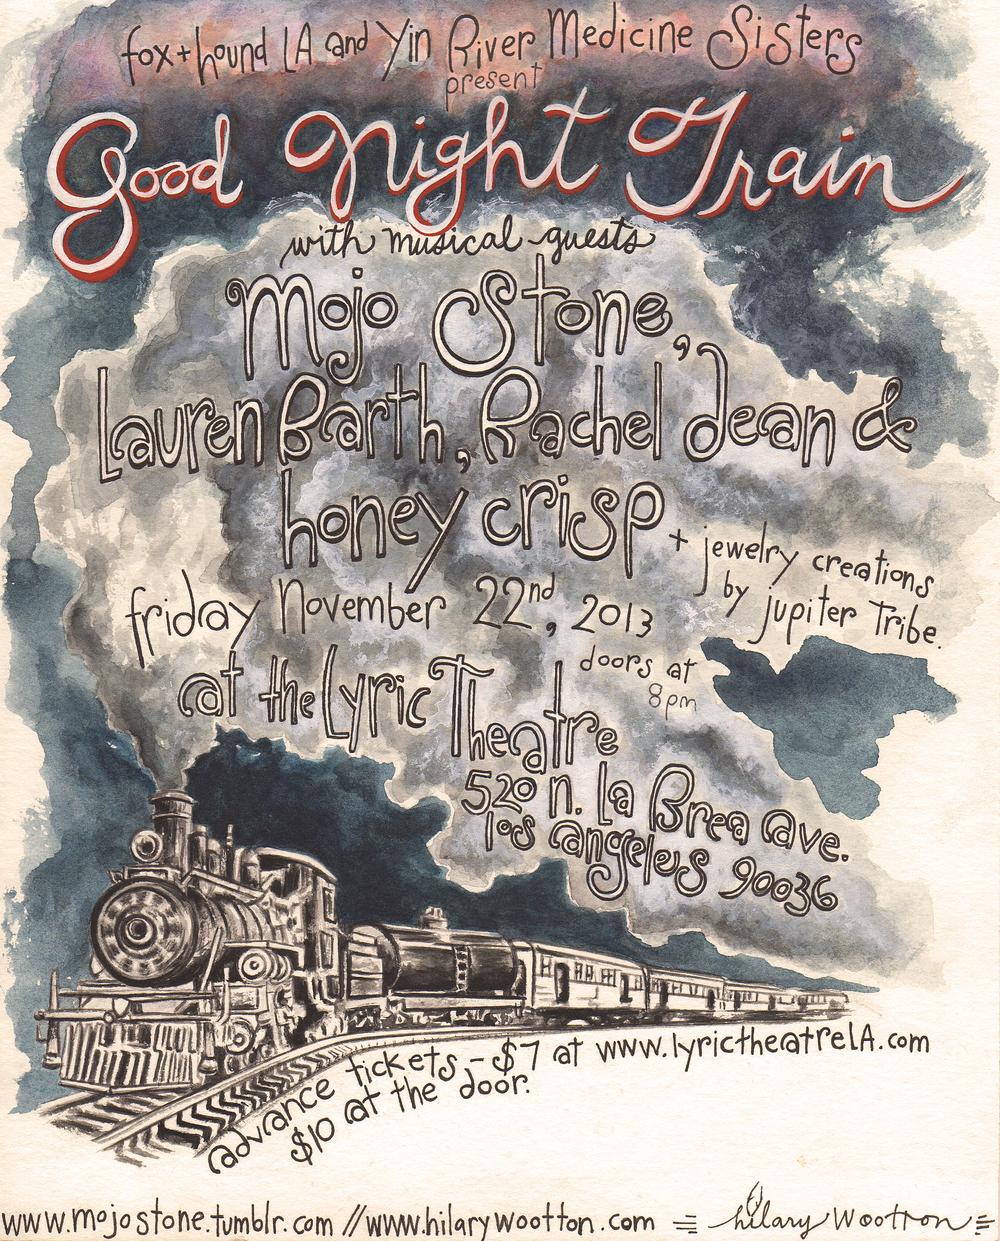 Mojo_GoodNightTrain_Poster1.jpg